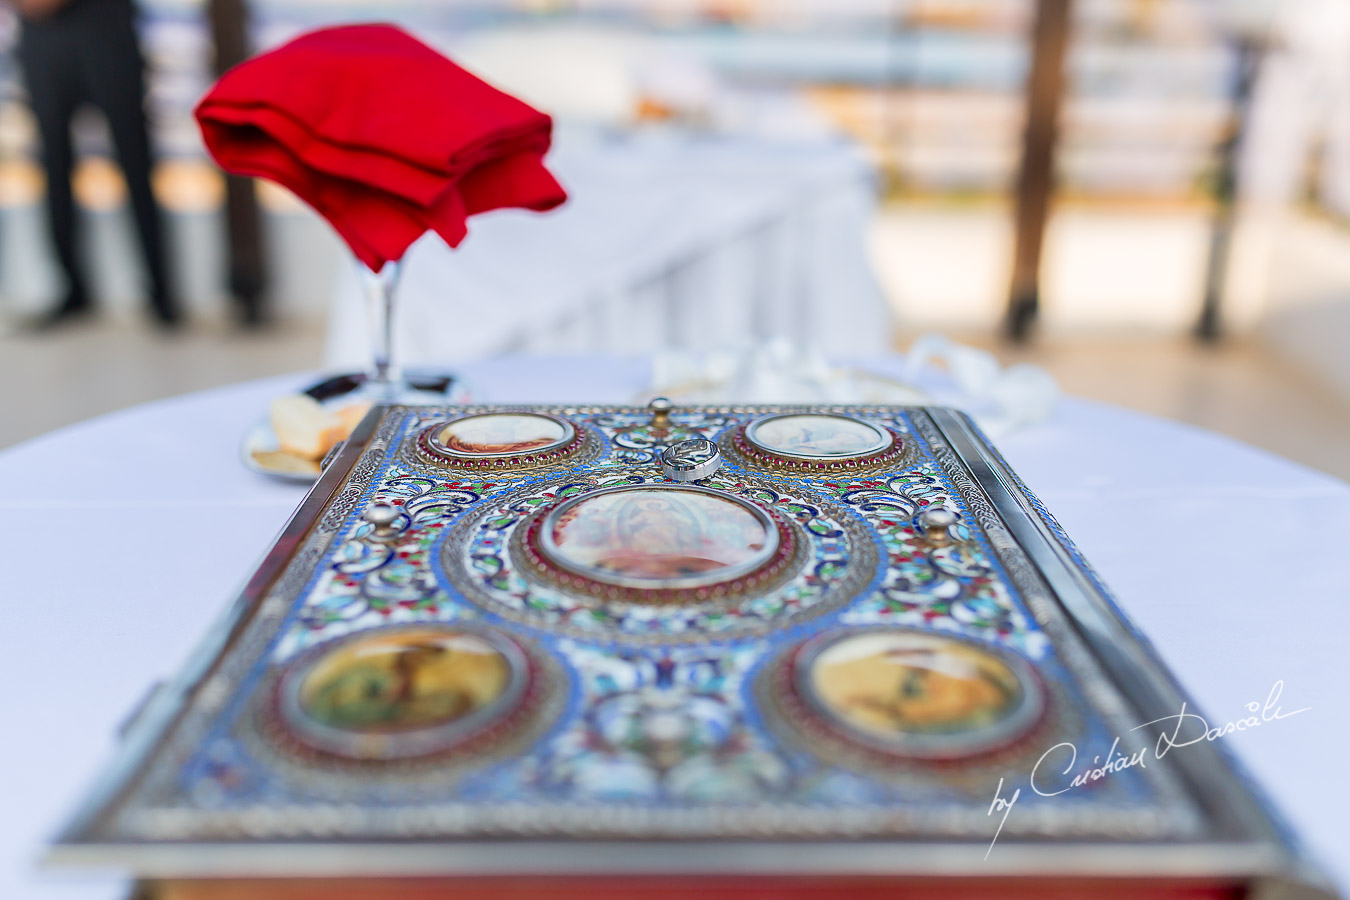 Wedding details captured at a wedding in Ayia Napa, Cyprus by Cristian Dascalu.